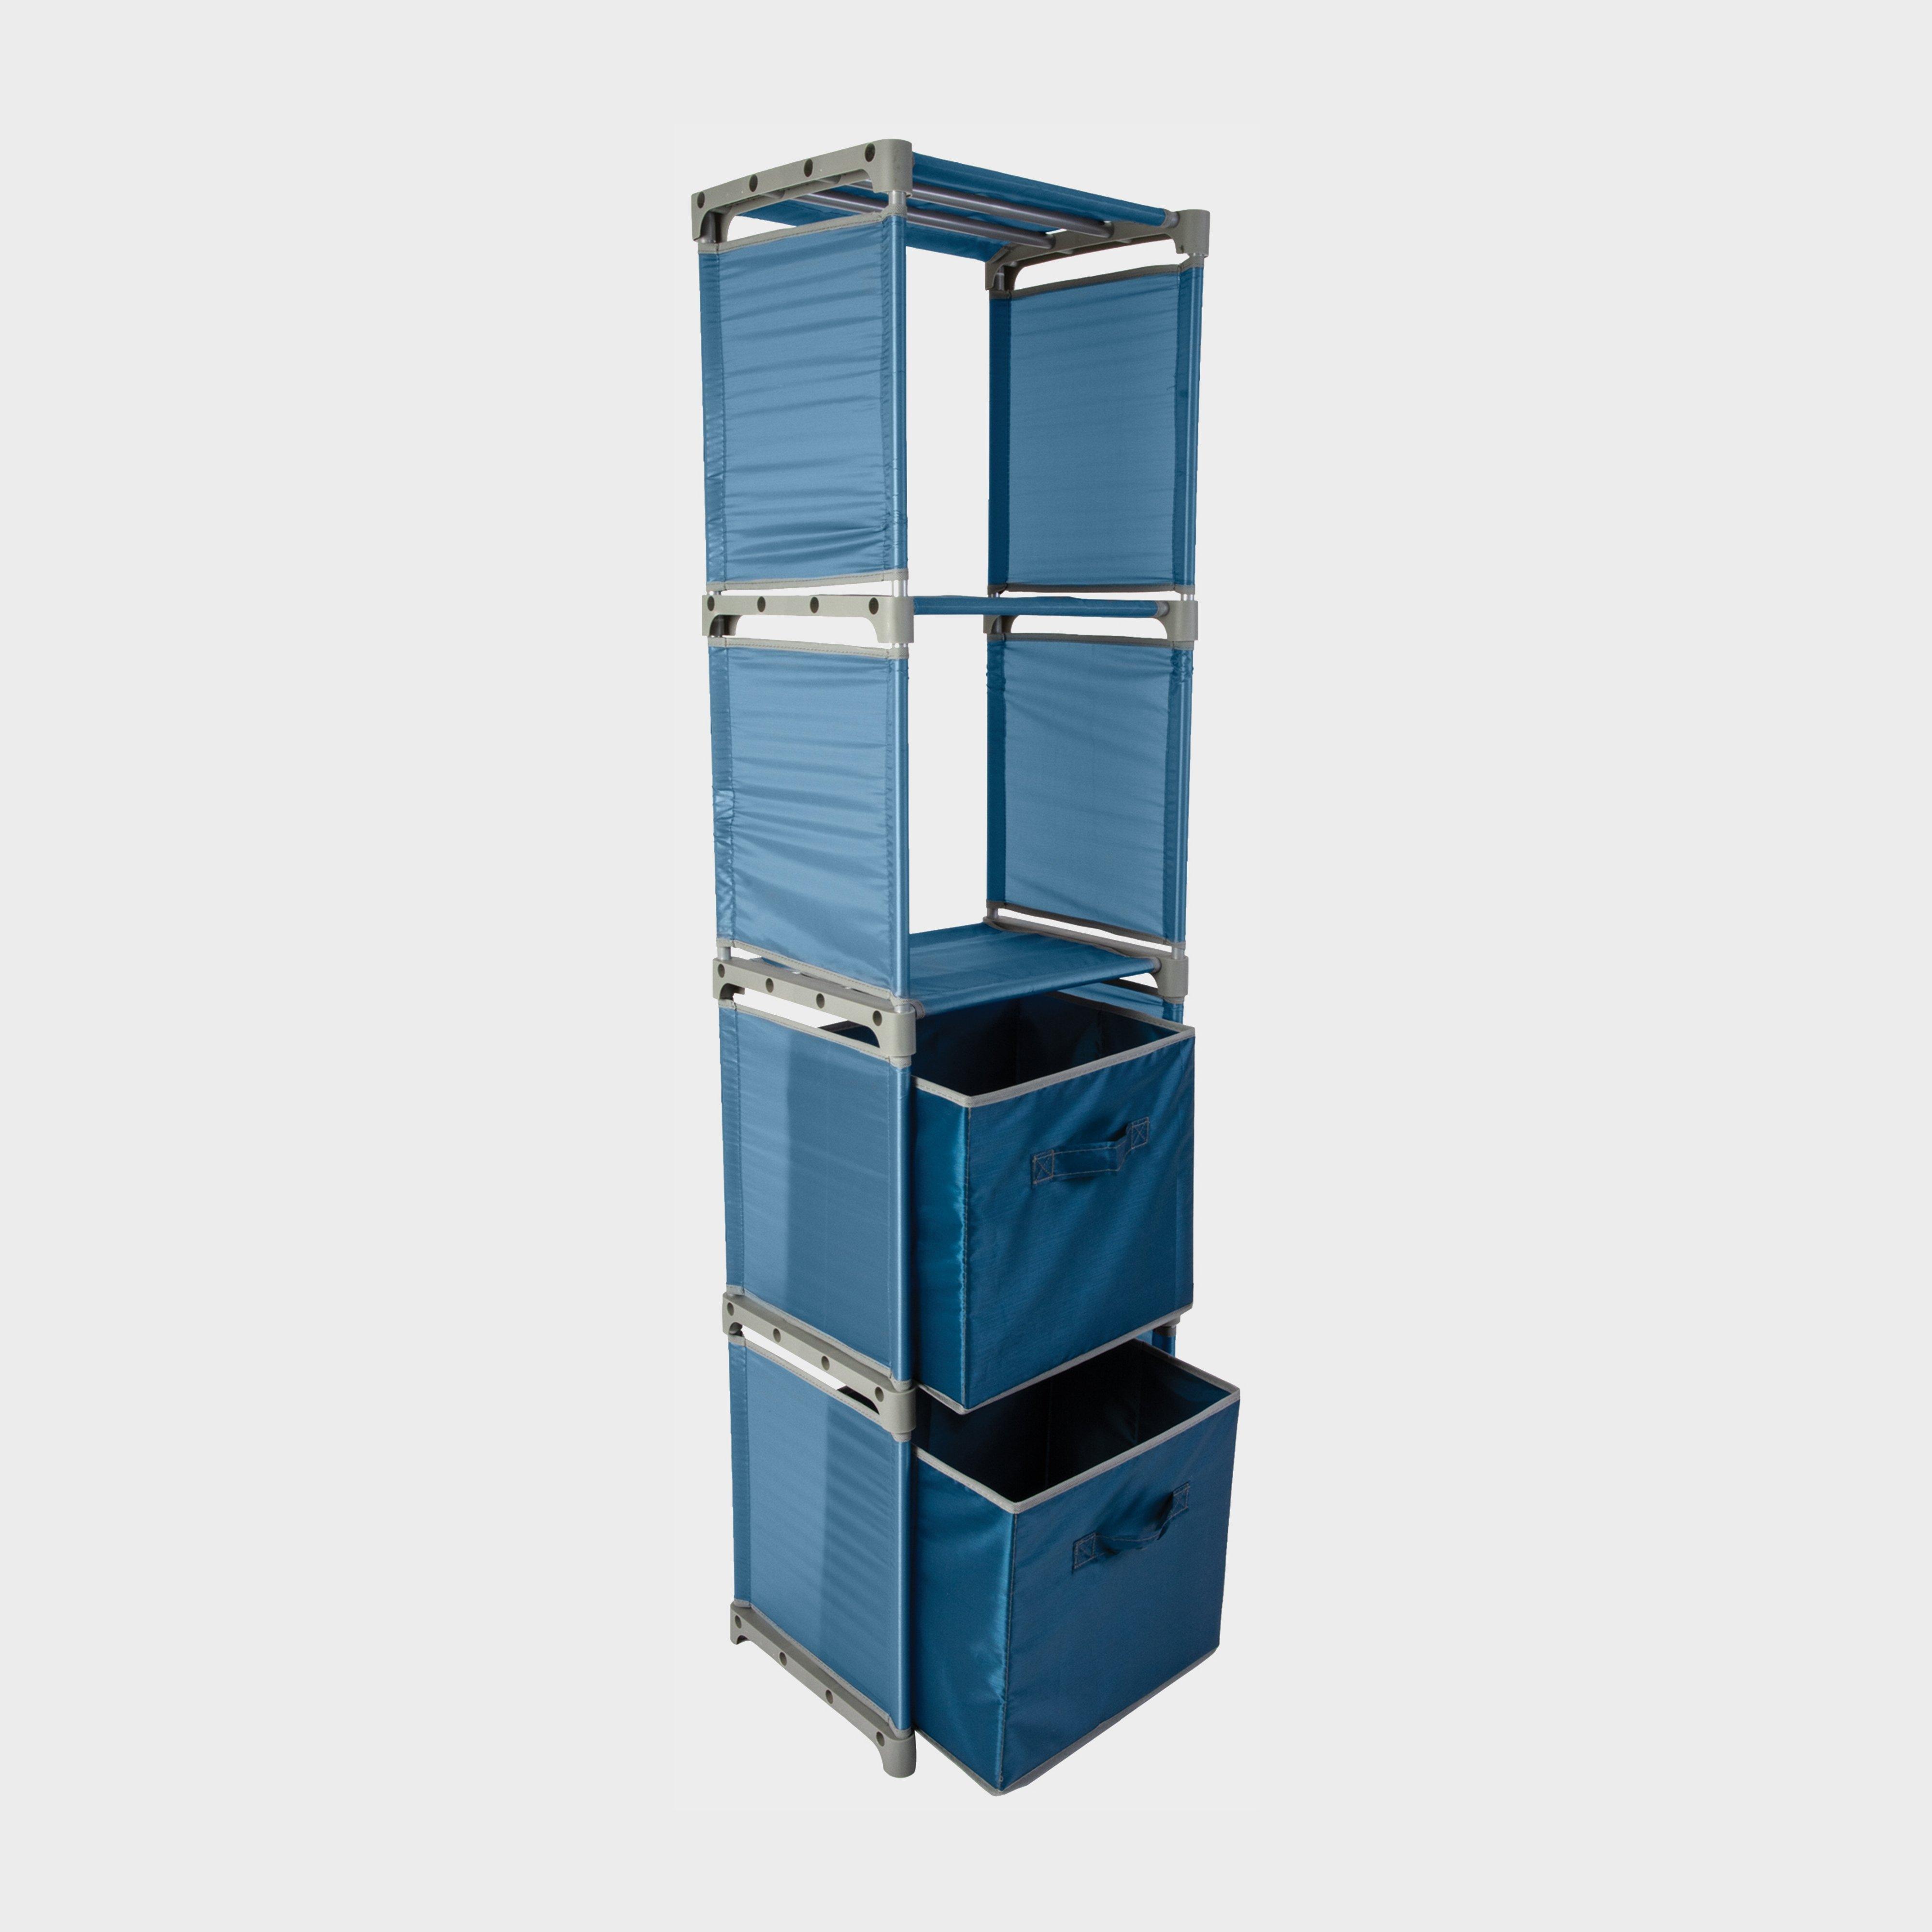 Quest Shelf Storage - Blue/Mgy, Blue